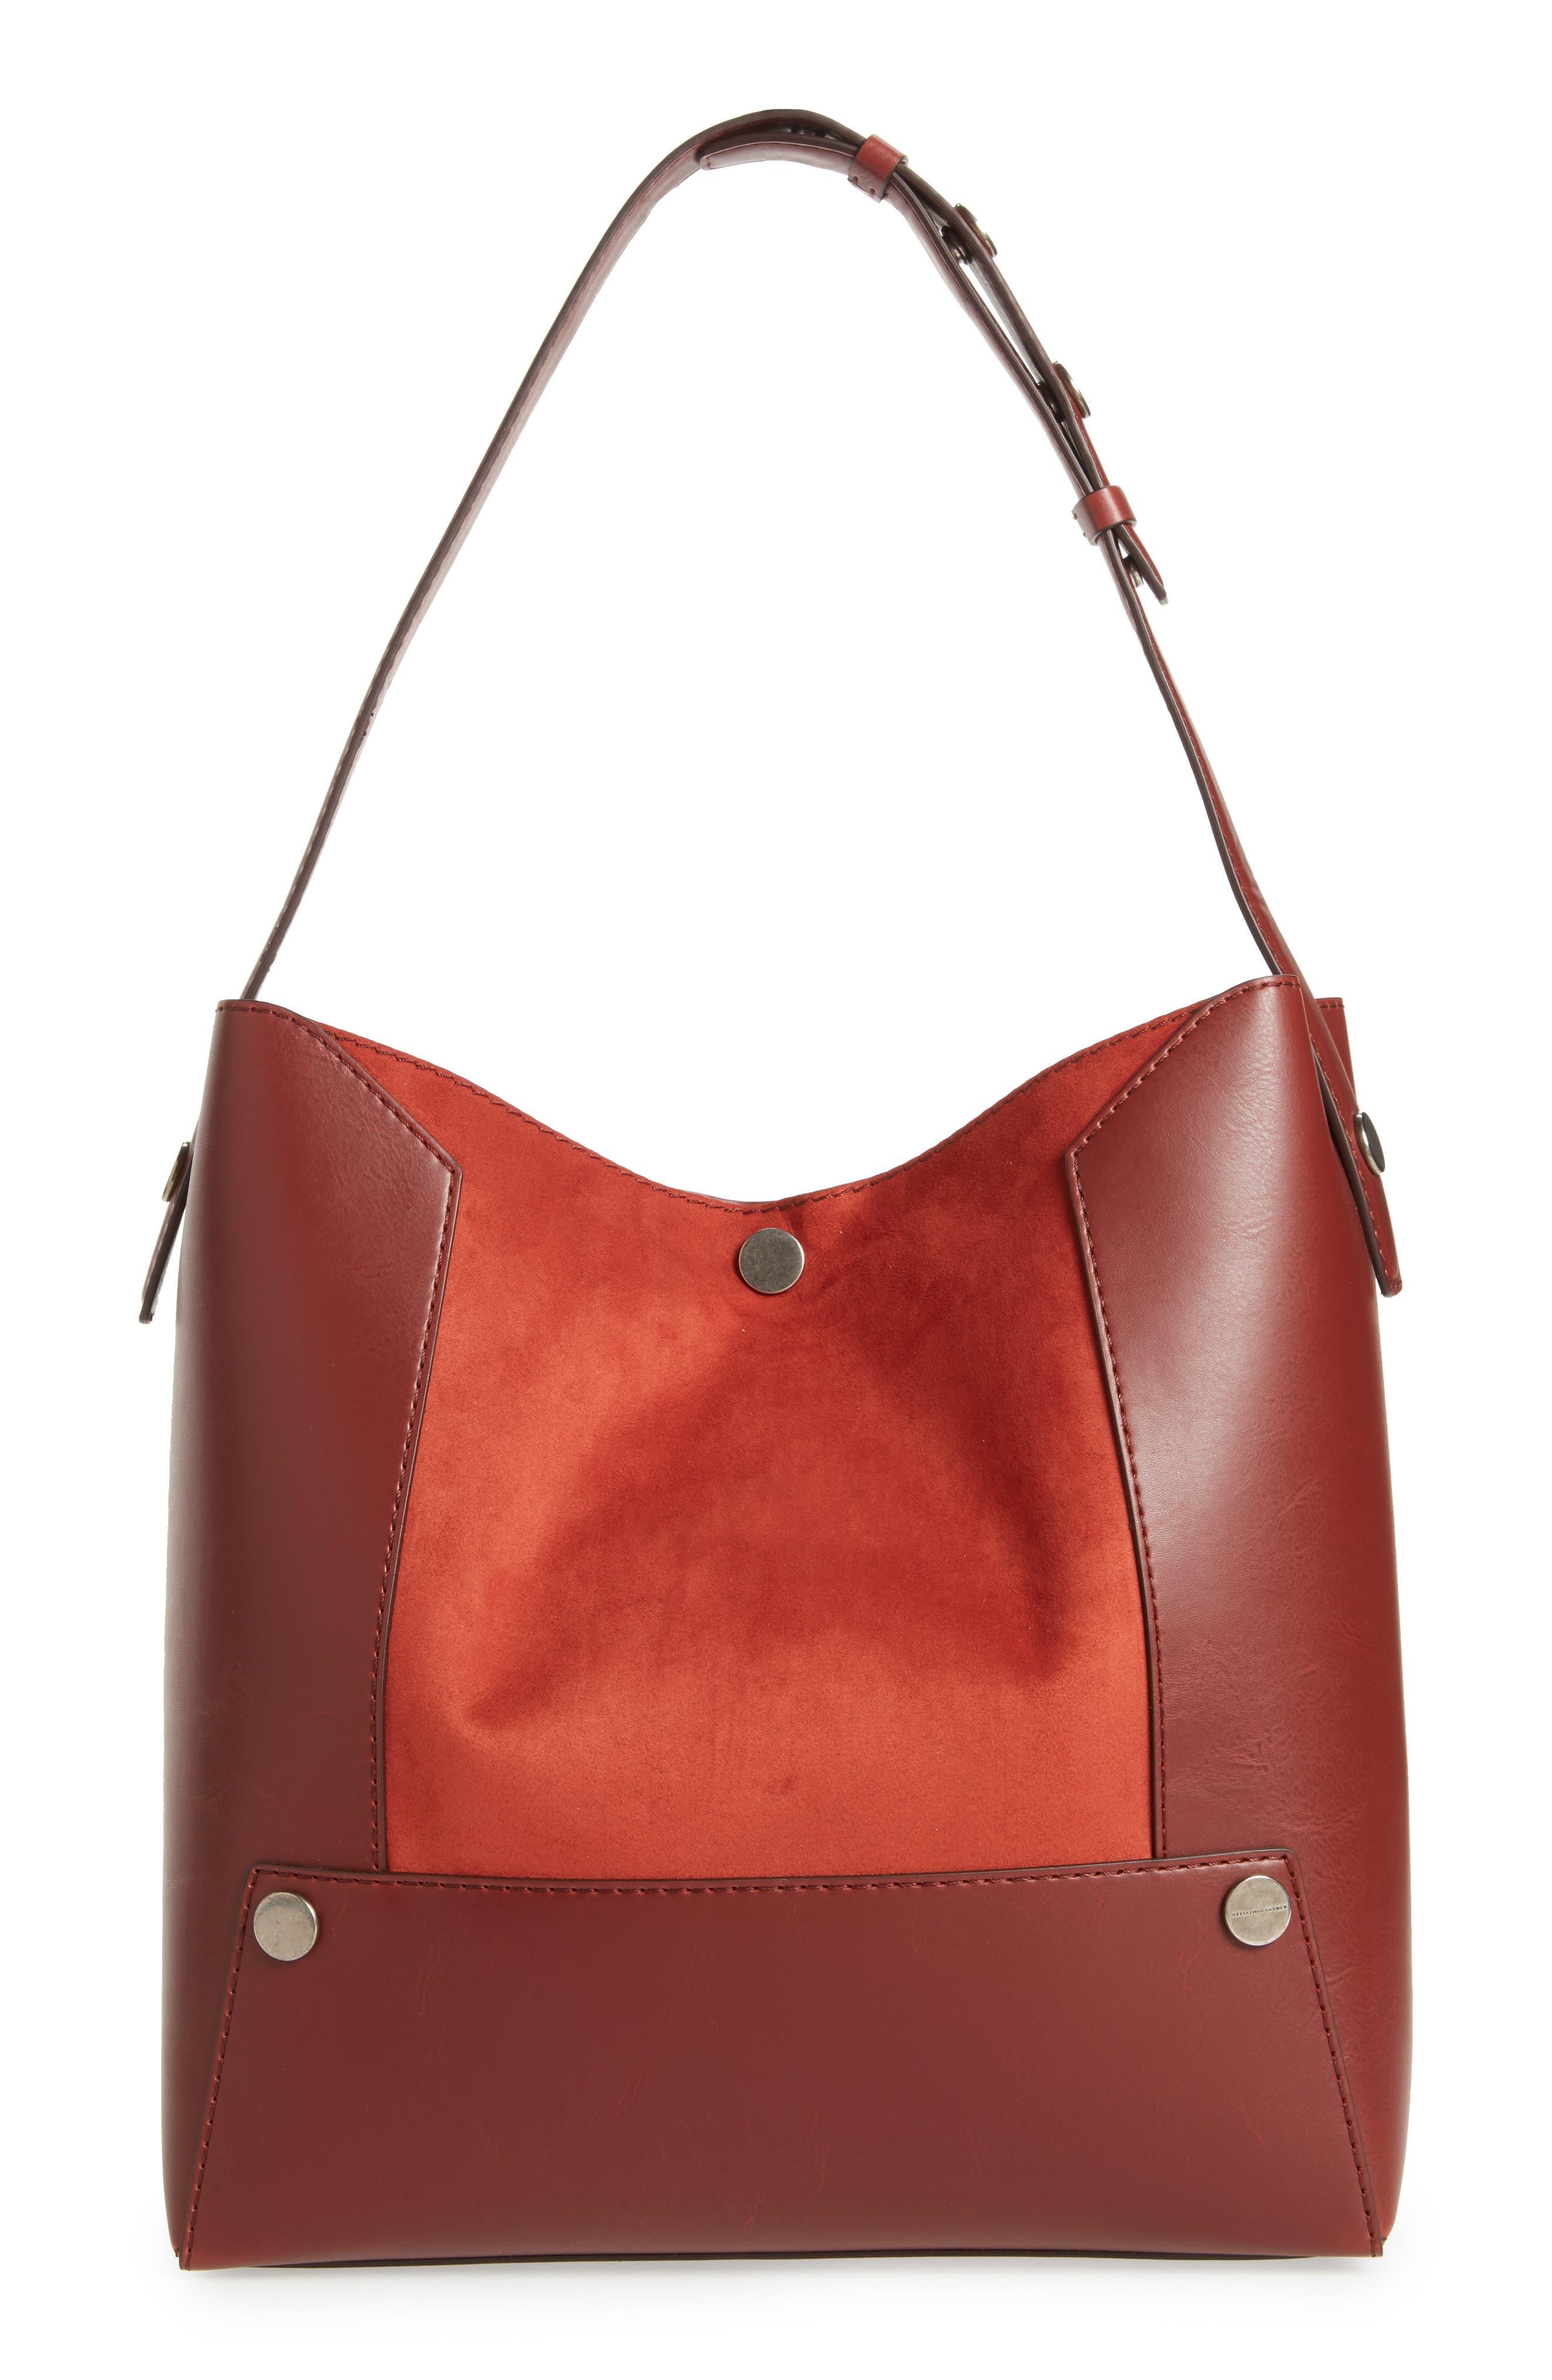 Stella McCartney Small Faux Leather Bucket Bag